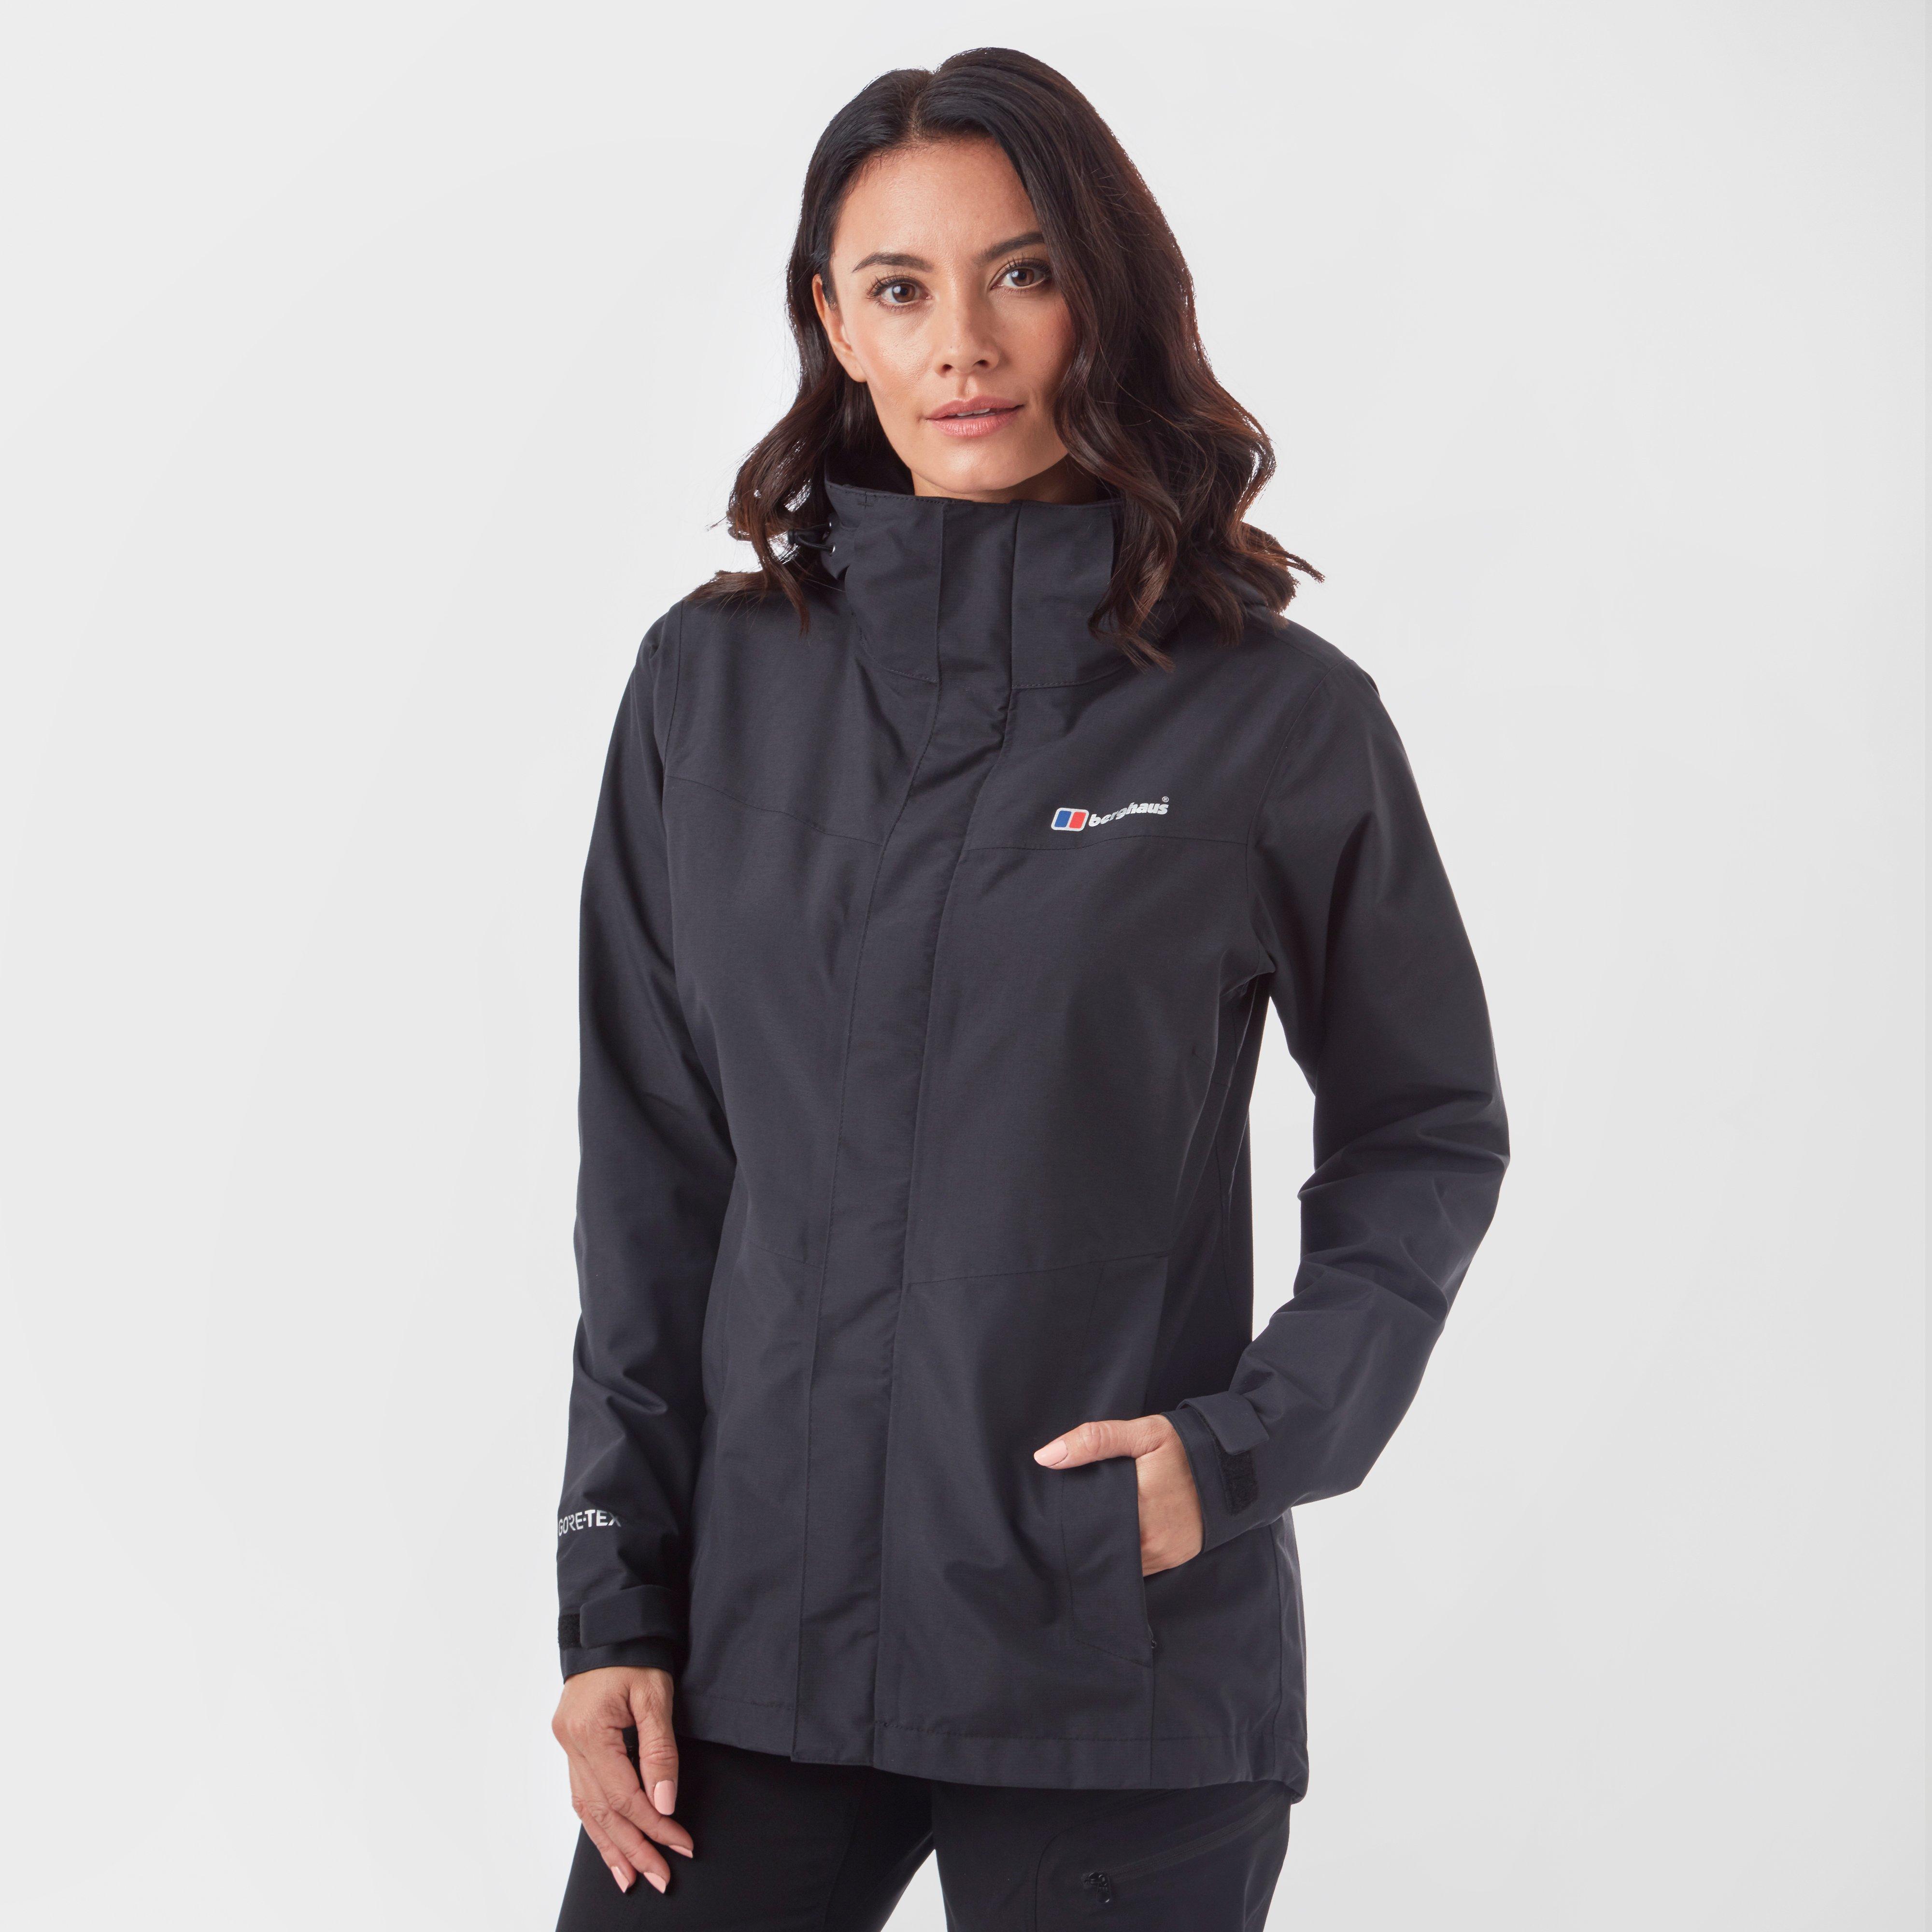 Berghaus Womens Maitland Gore-tex  Jacket - Black/black  Black/black